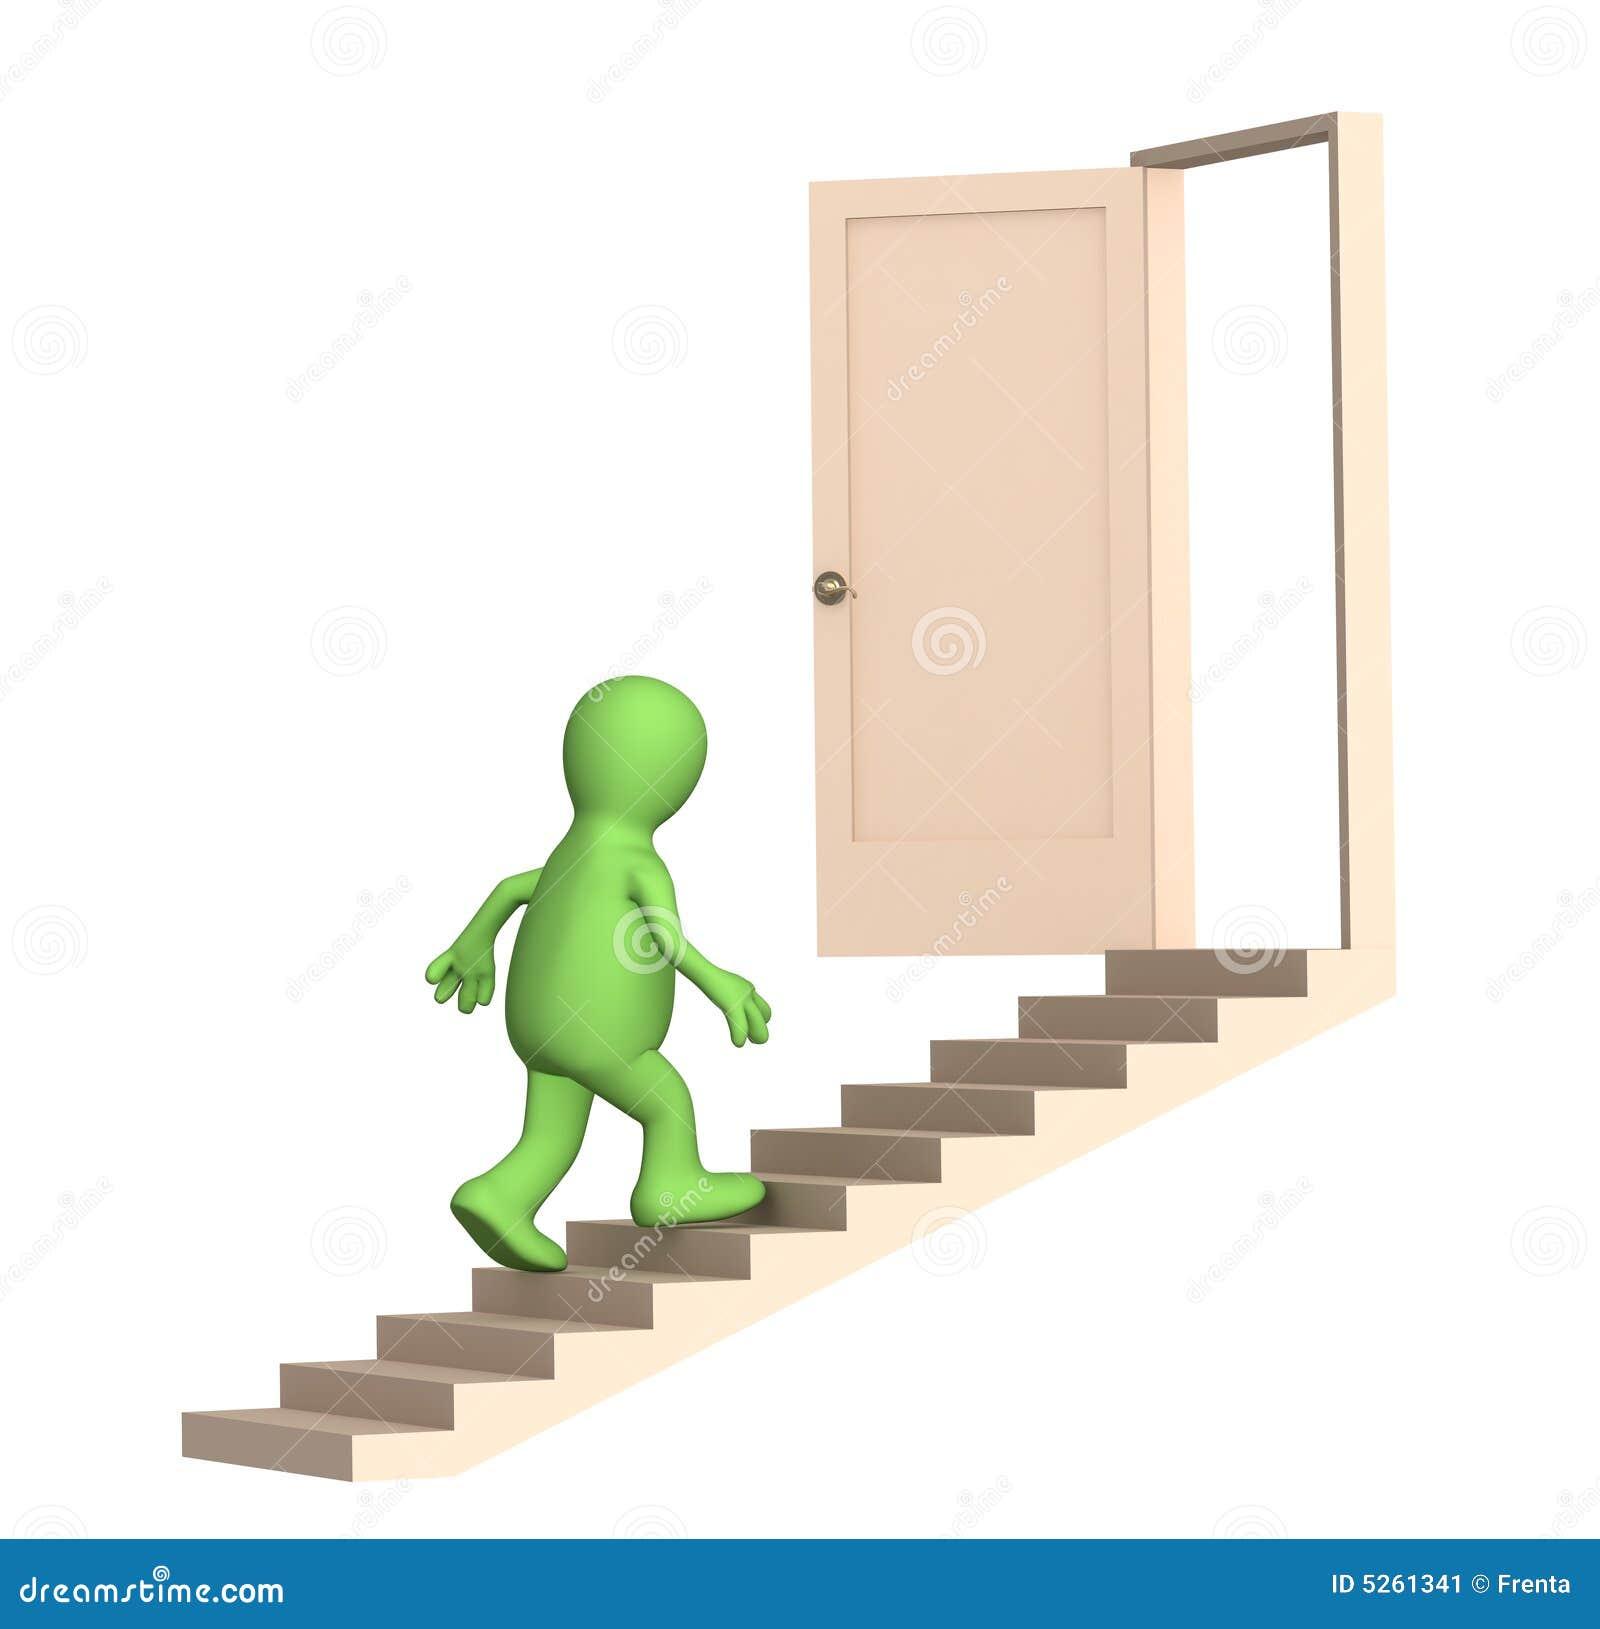 Puppet Walking Upstairs To An Open Door Stock Image - Image: 5261341